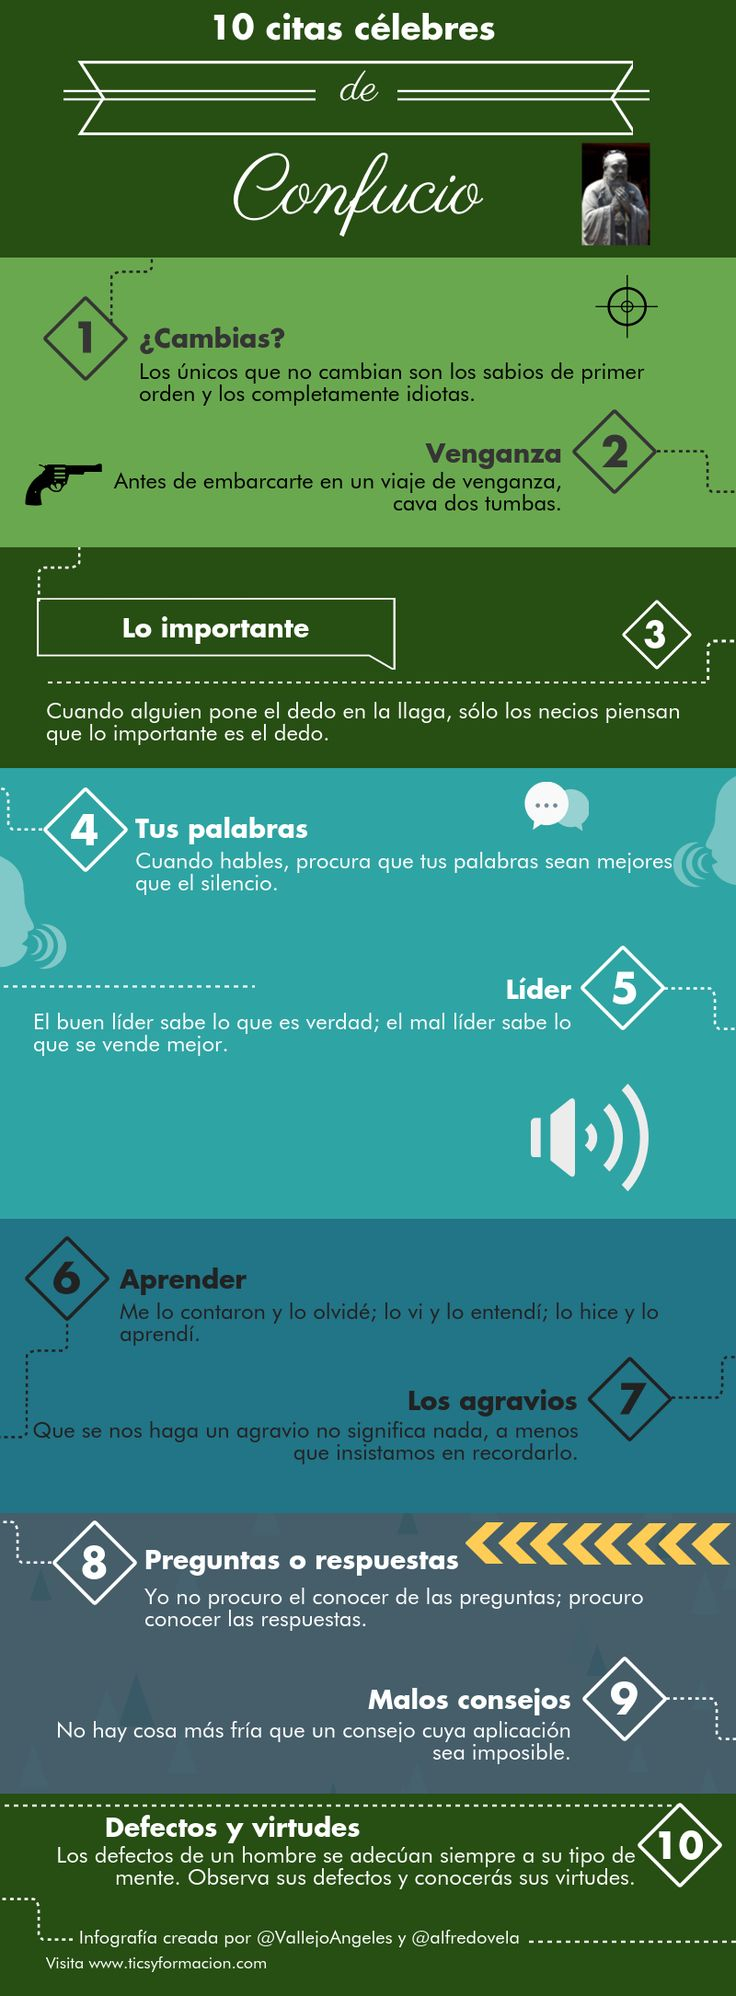 10 citas célebres de Confucio #infografia #infographic #citas #quotes